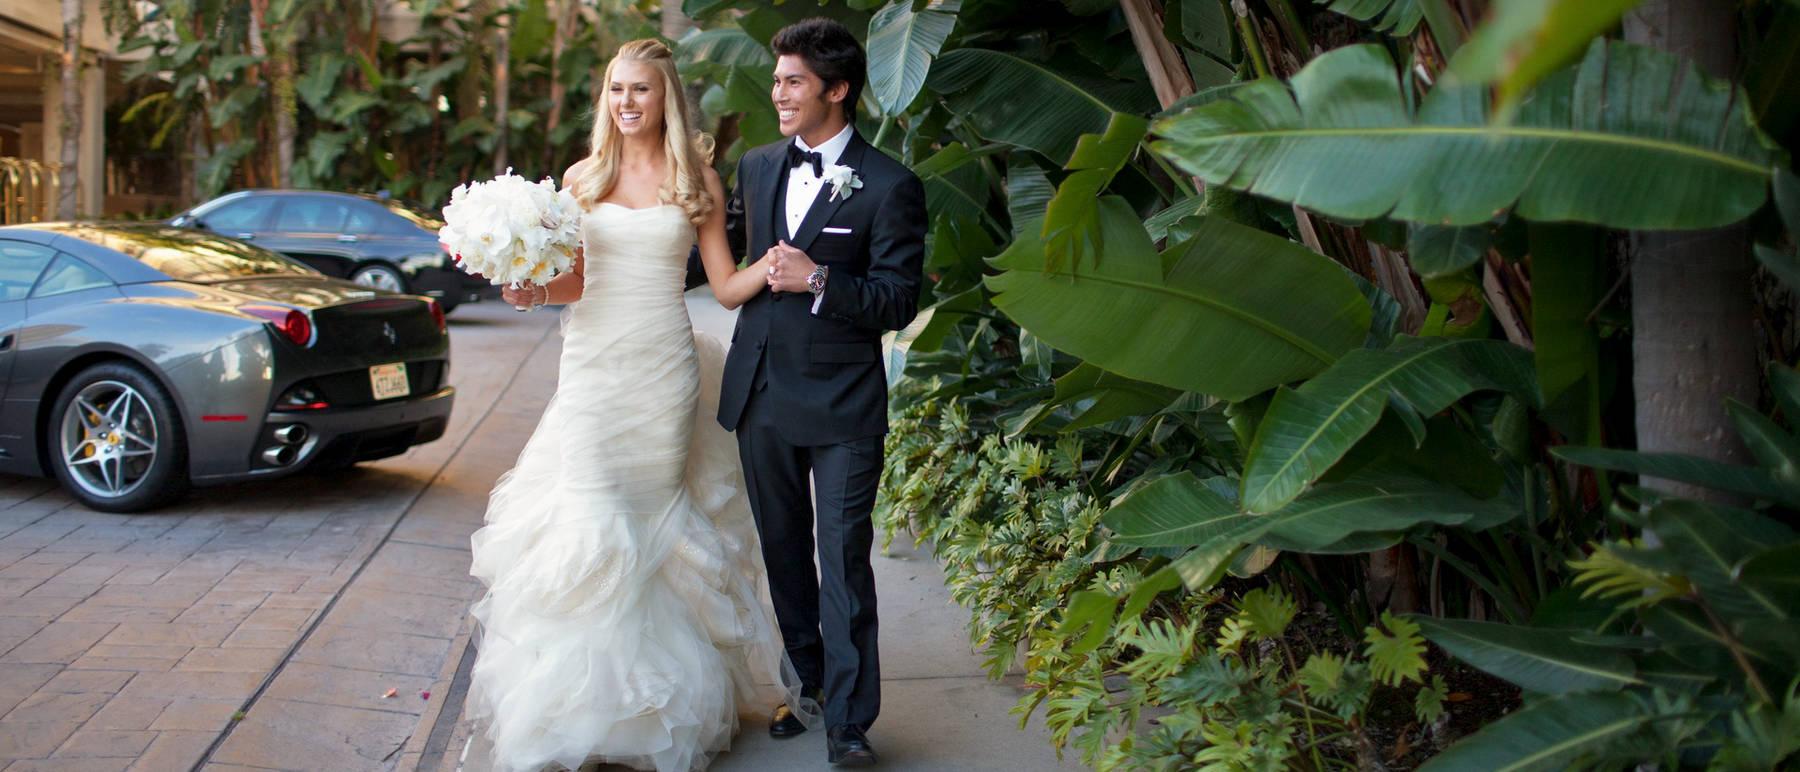 johnandjoseph-wedding-photographer-hz-slider-311